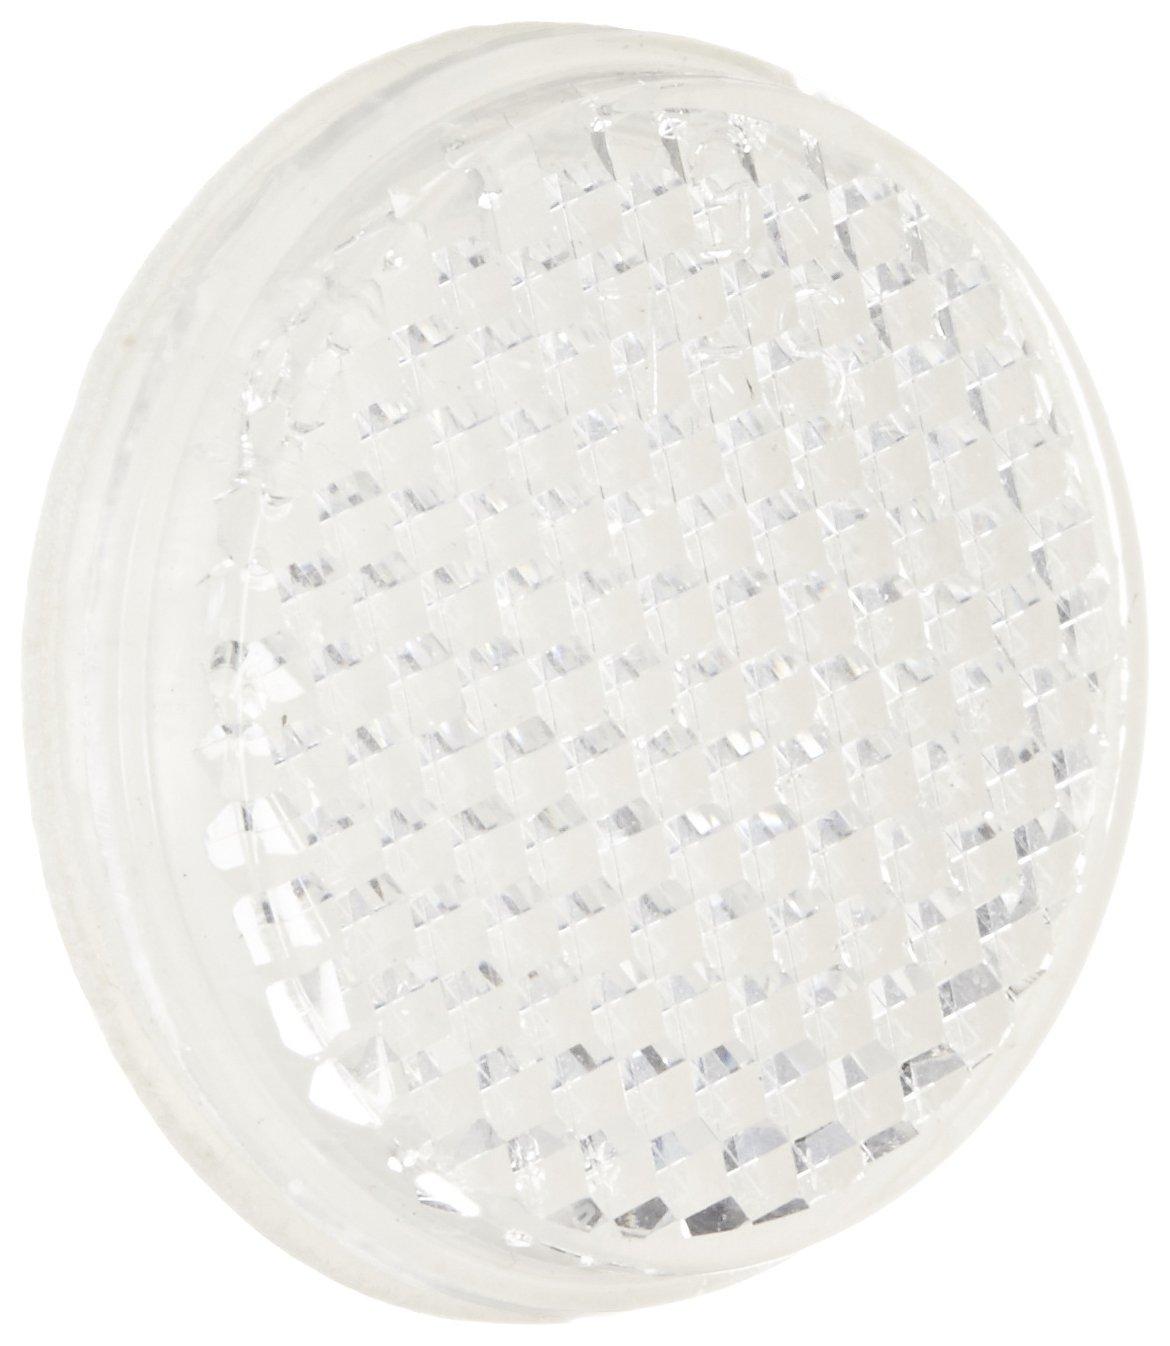 Eaton 6200A-6504 Round Retroreflector, Corner Cube Material, Adhesive Backed, 1-1/4'' Diameter, Plastic